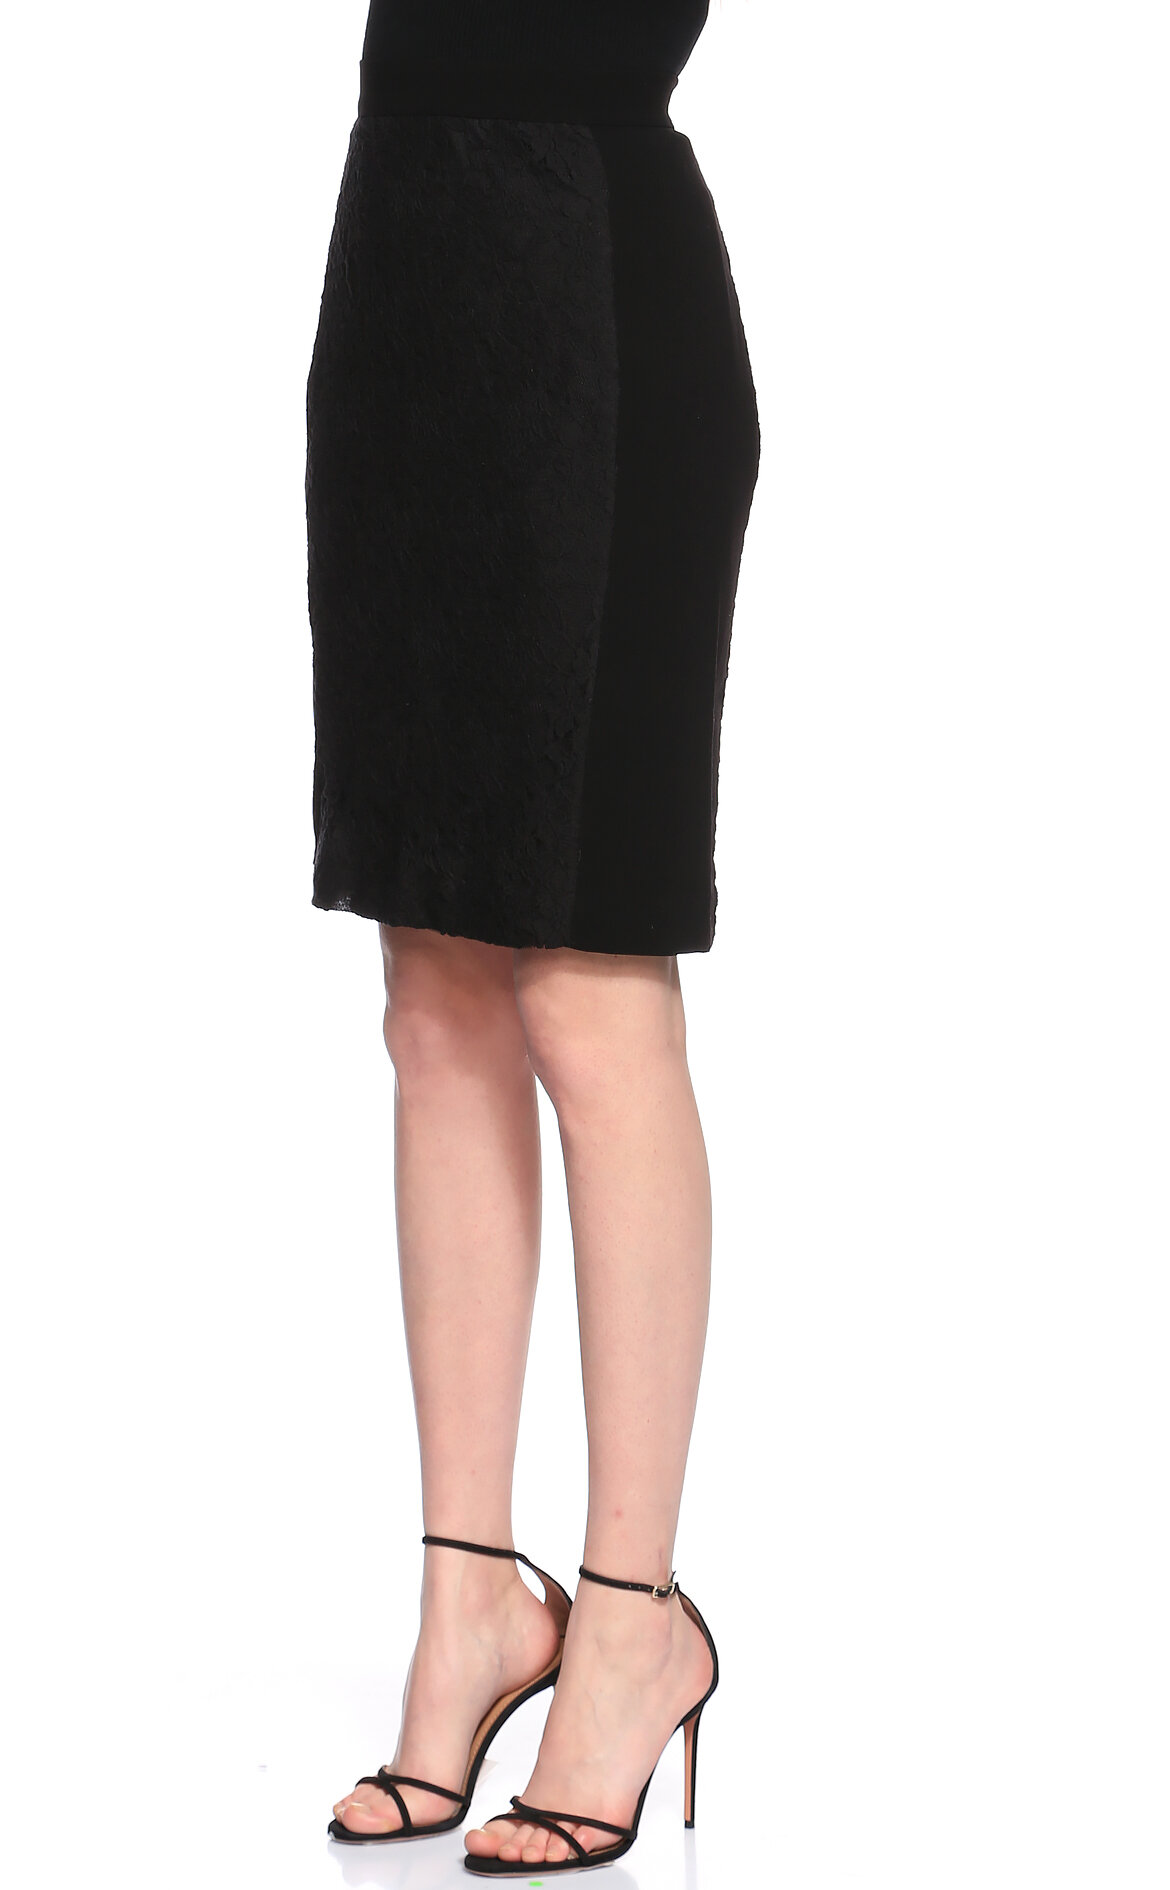 DKNY Dantel Detaylı Siyah Etek